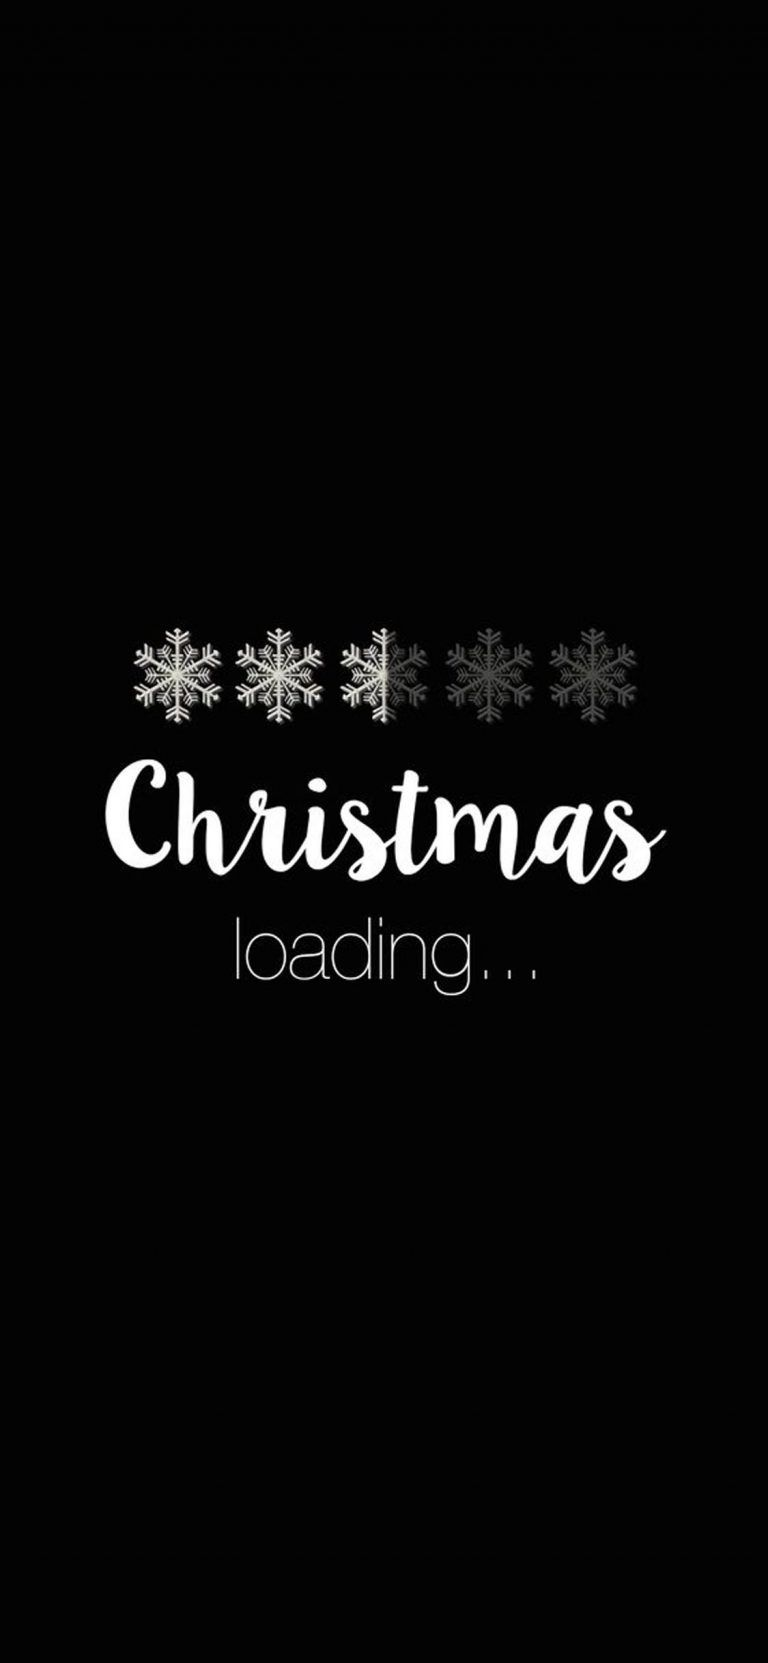 Iphone X Beautiful Wallpaper 1125 2436 Christmas Background Cute And Vintage Backgr Wallpaper Iphone Christmas Christmas Background Cute Christmas Wallpaper